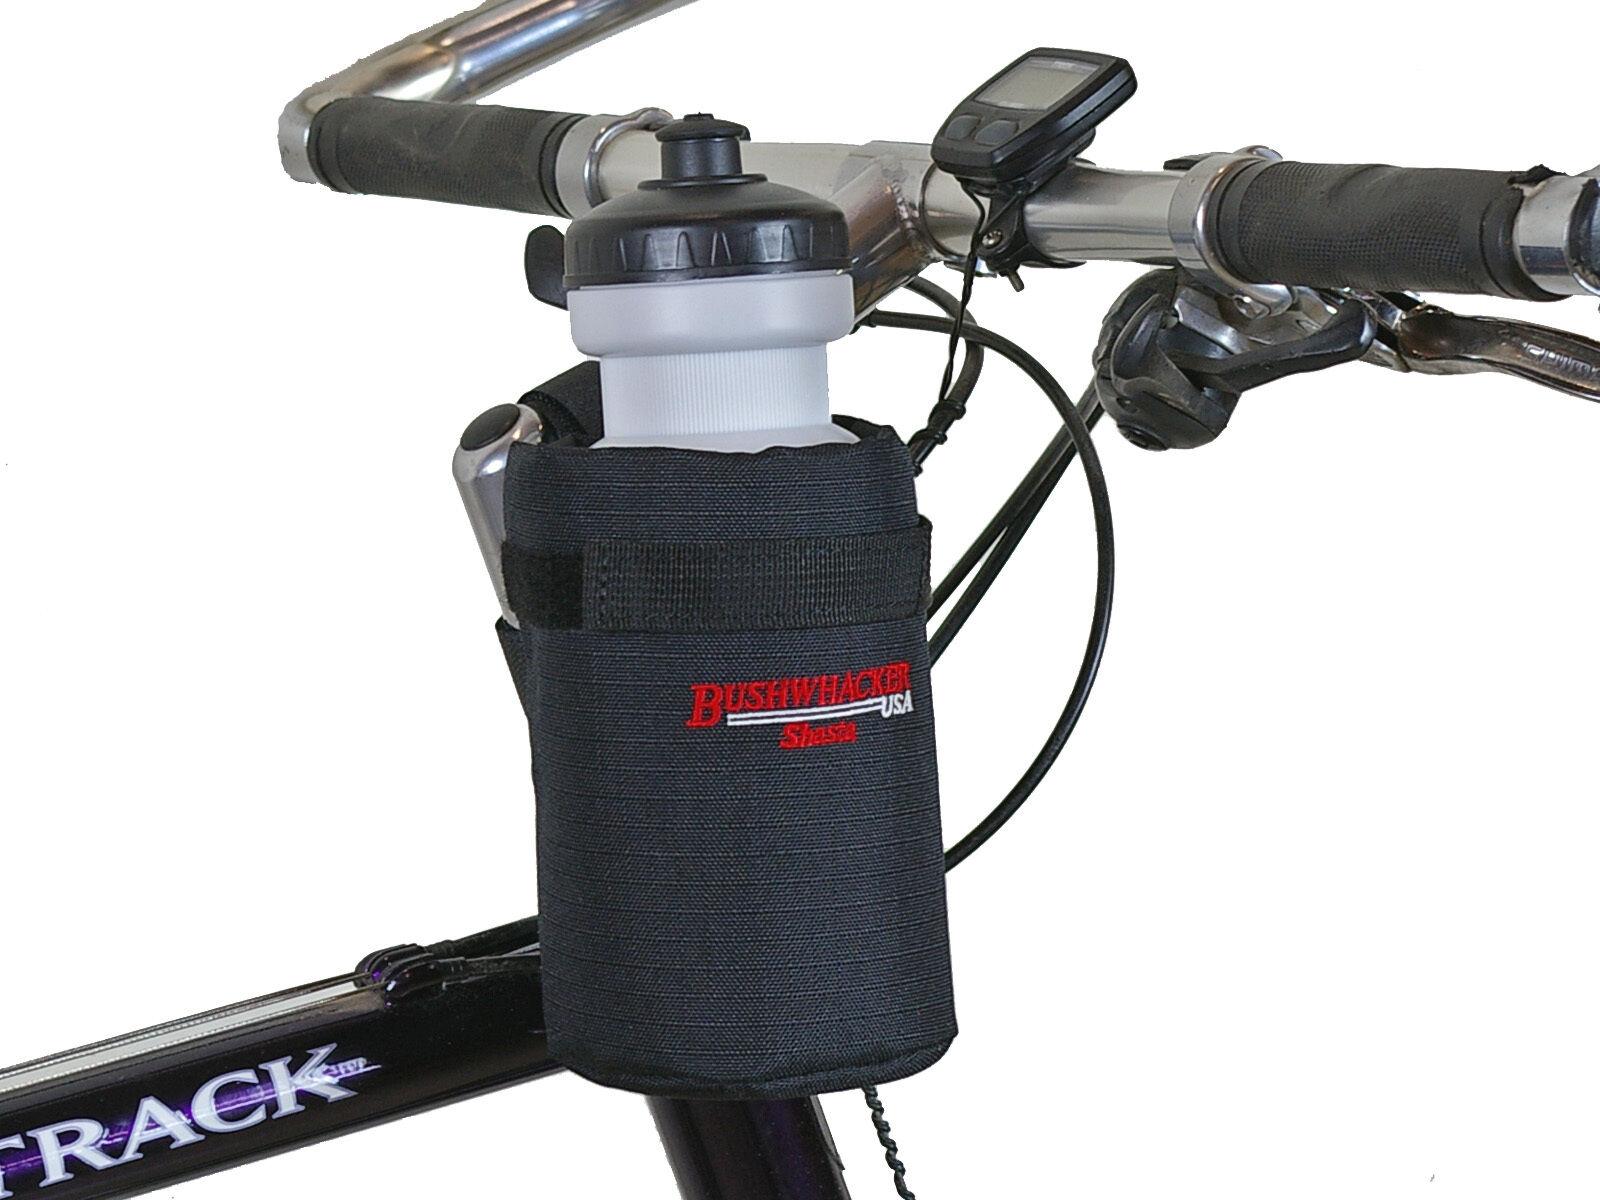 Merida Water Bottle Holder up to Ø 7 CM Bicycle Bike Bottle Holder Aluminum Alloy